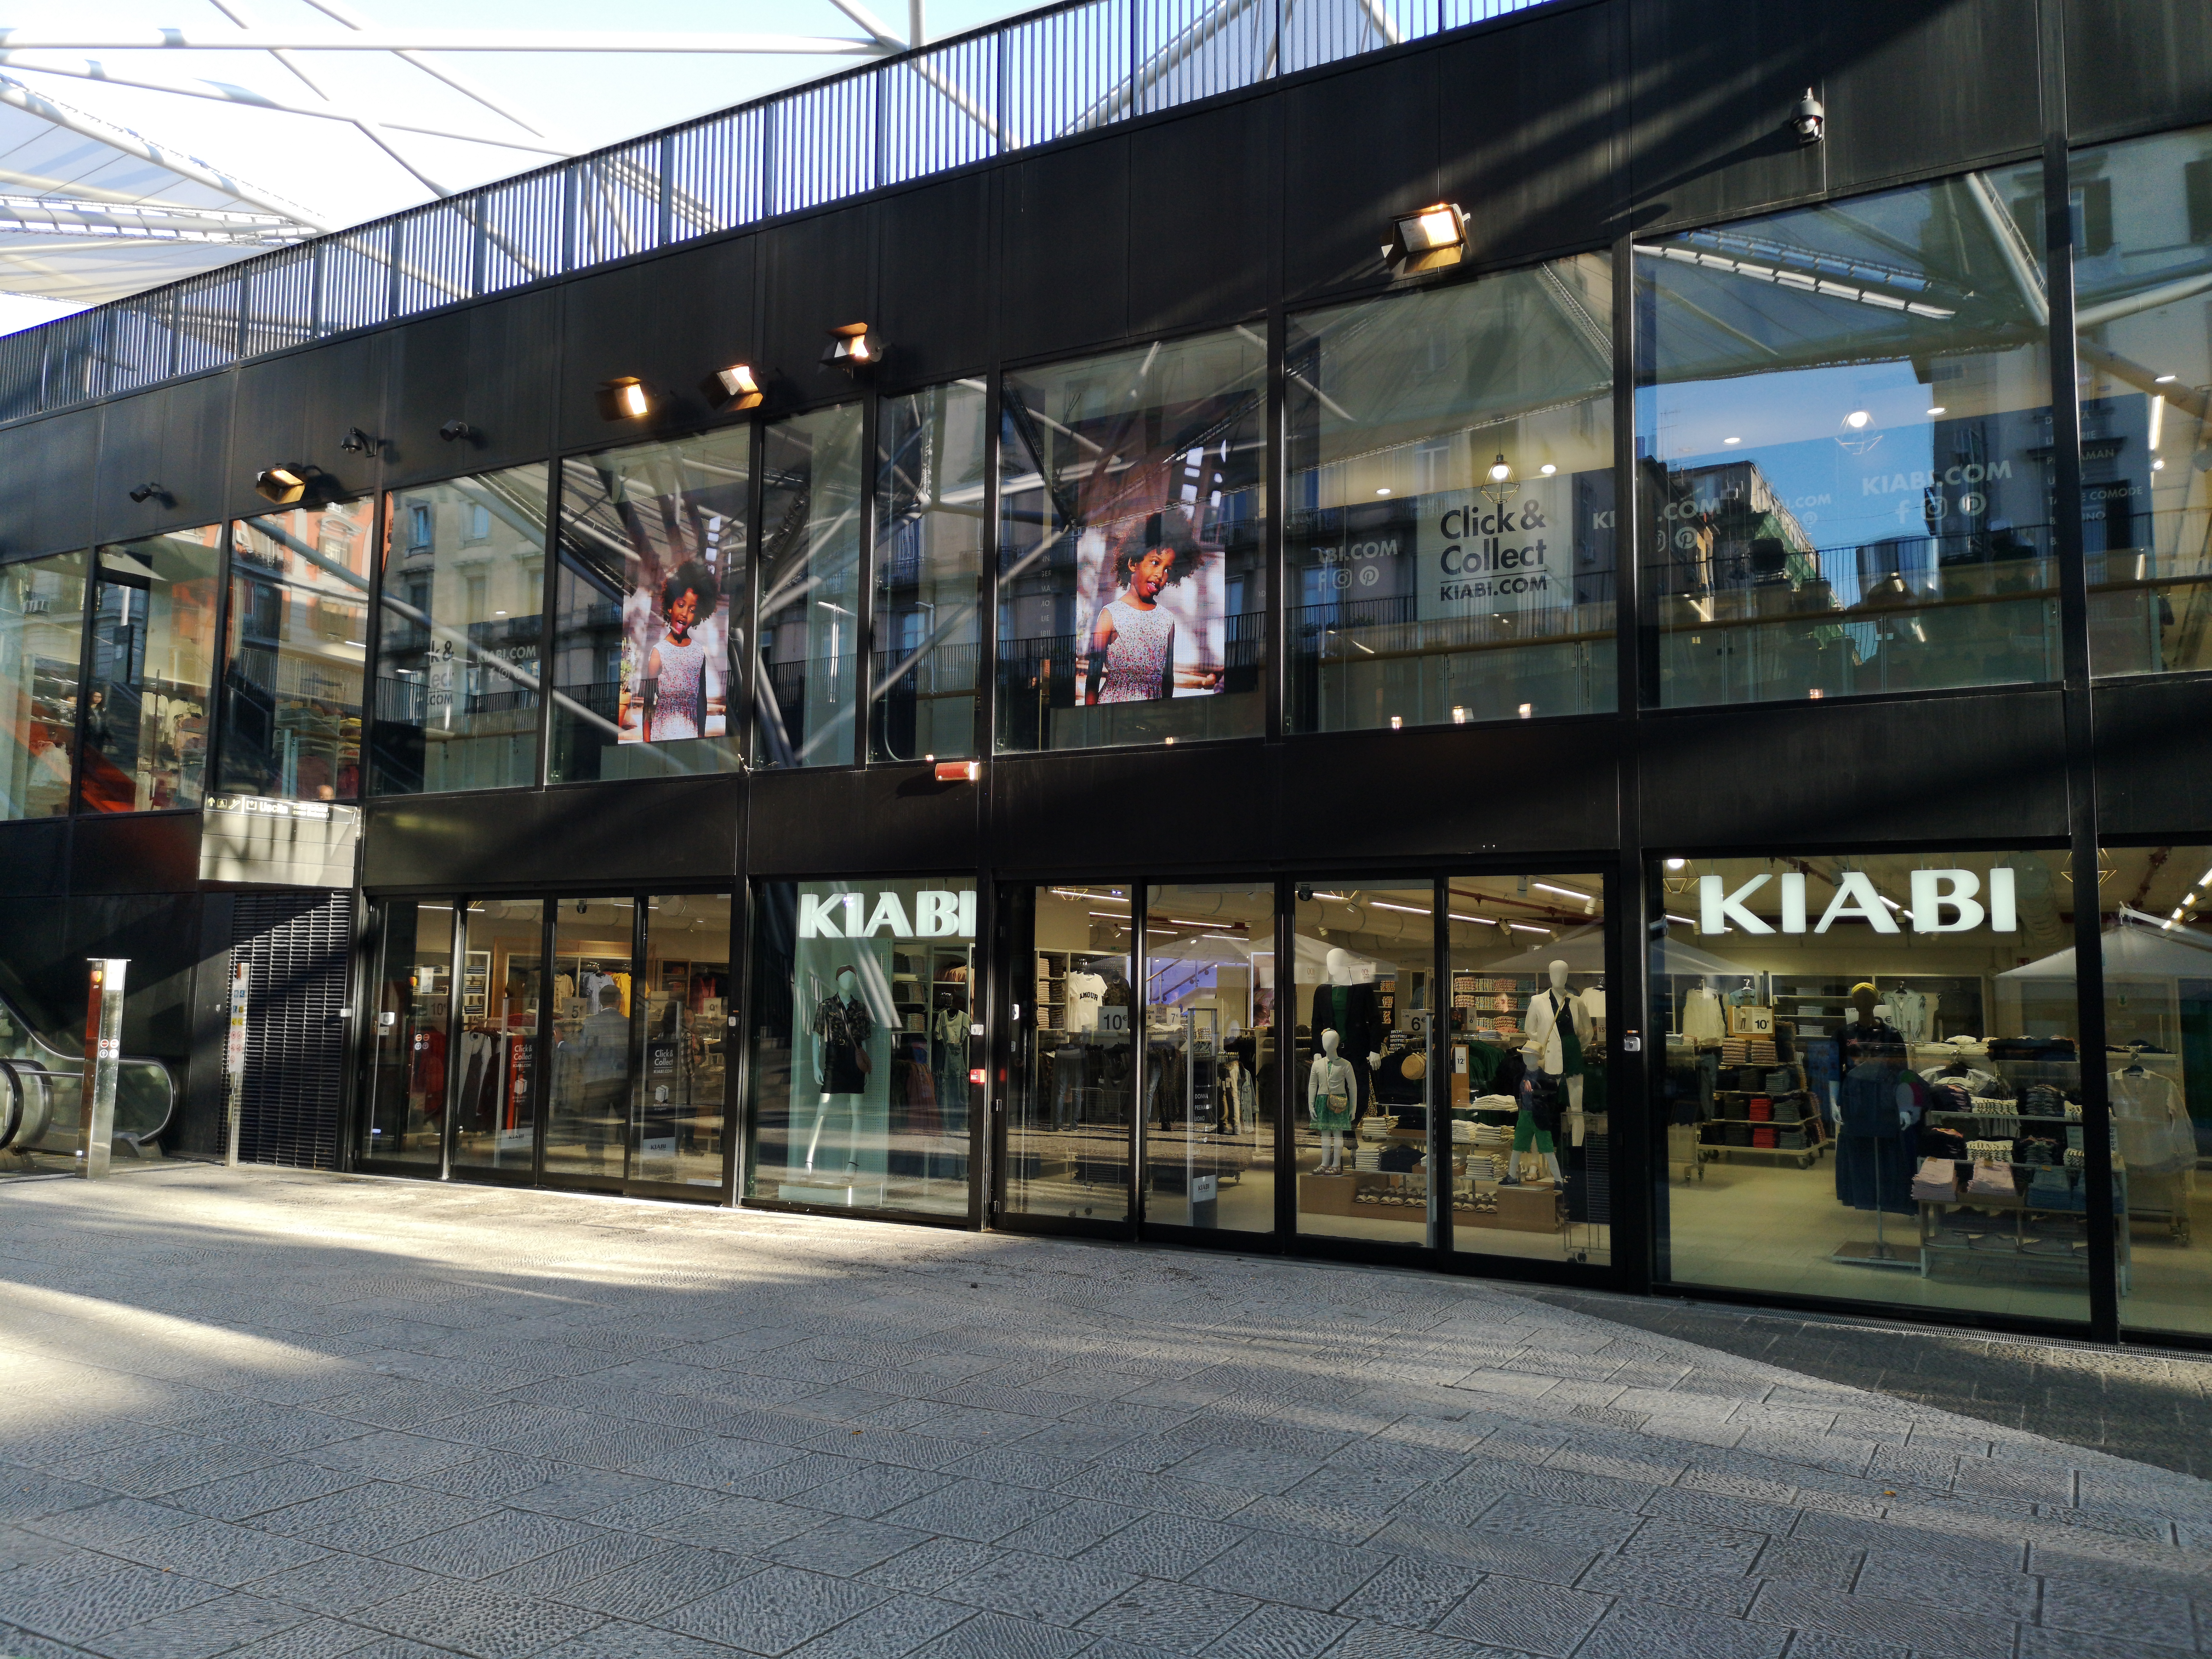 Kiabi opens its doors to franchising